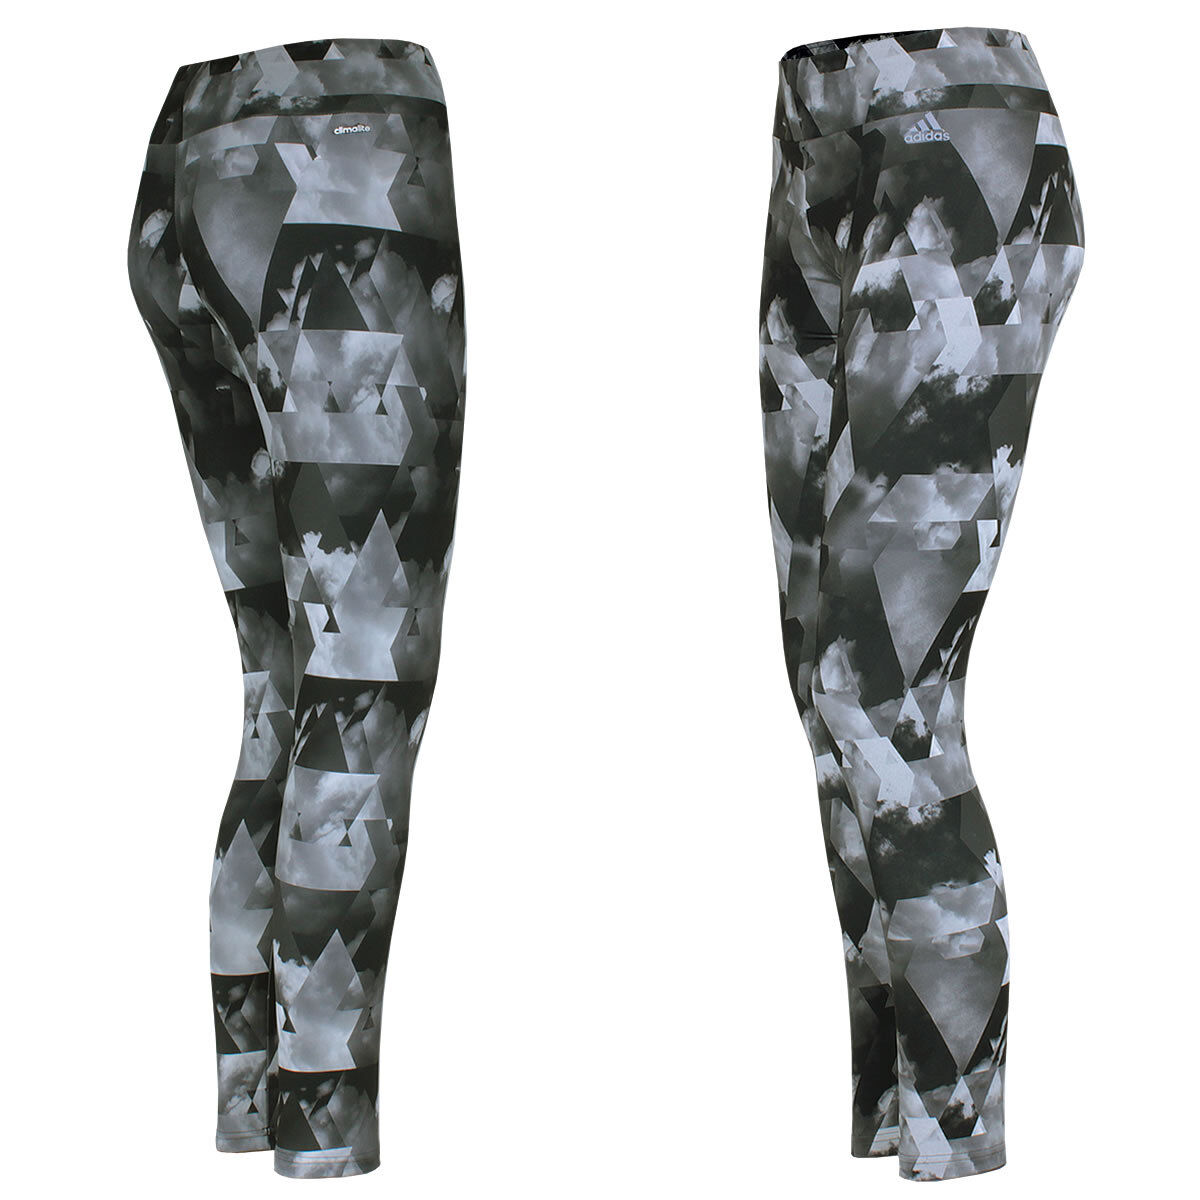 Adidas DaSie Workout Climalite AOP Tight Hose Leggings Sporthose Fitnesshose